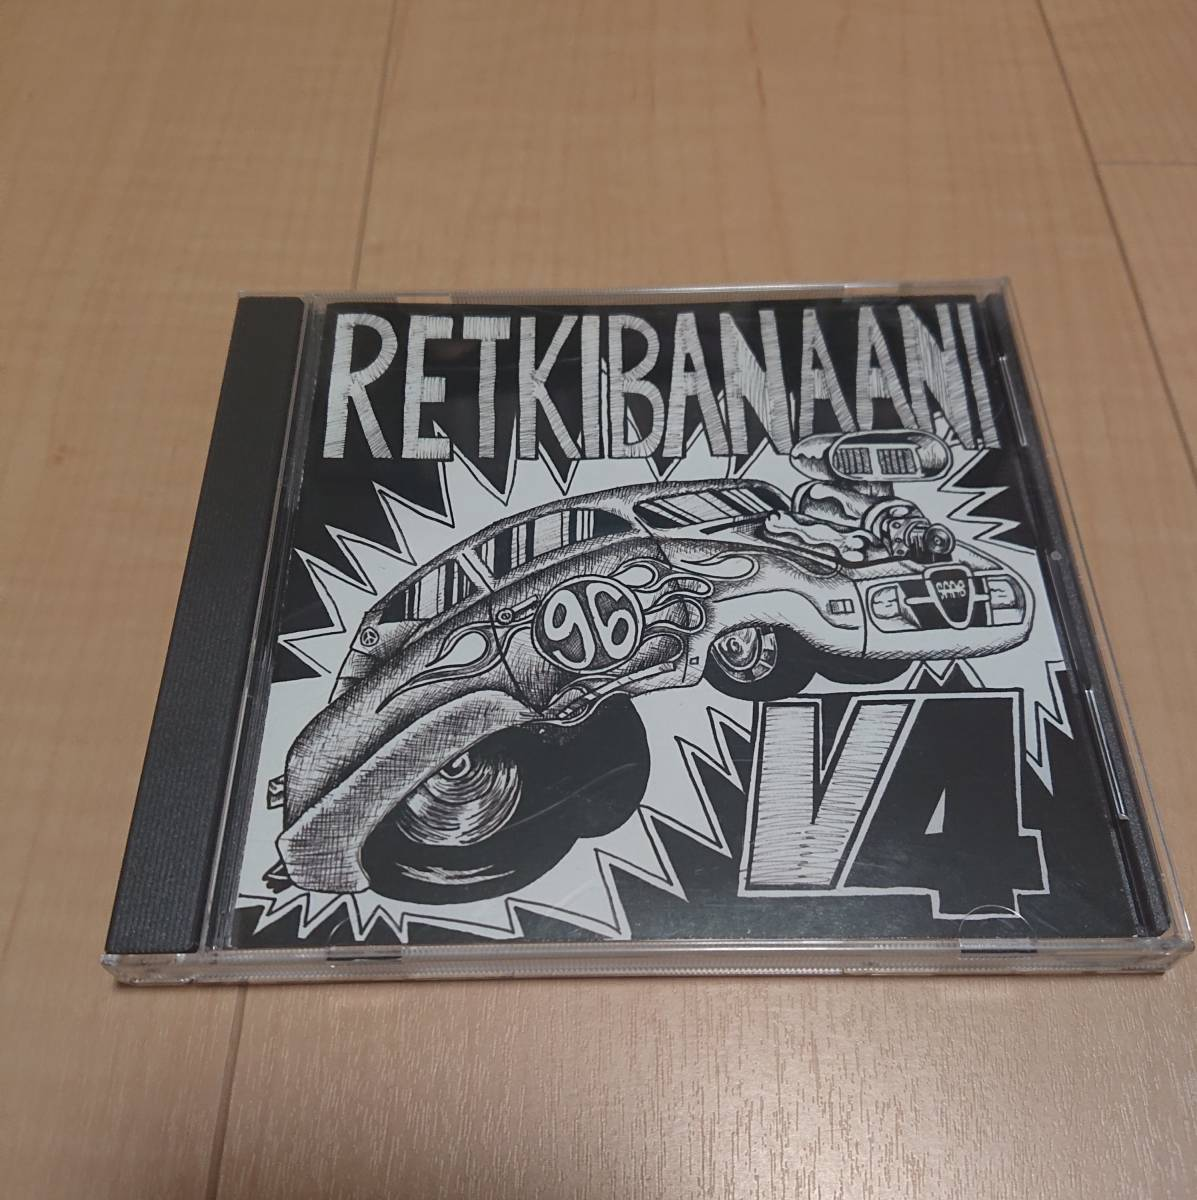 【Retkibanaani - V4】shock treatment depressing claim klamydia pop punk